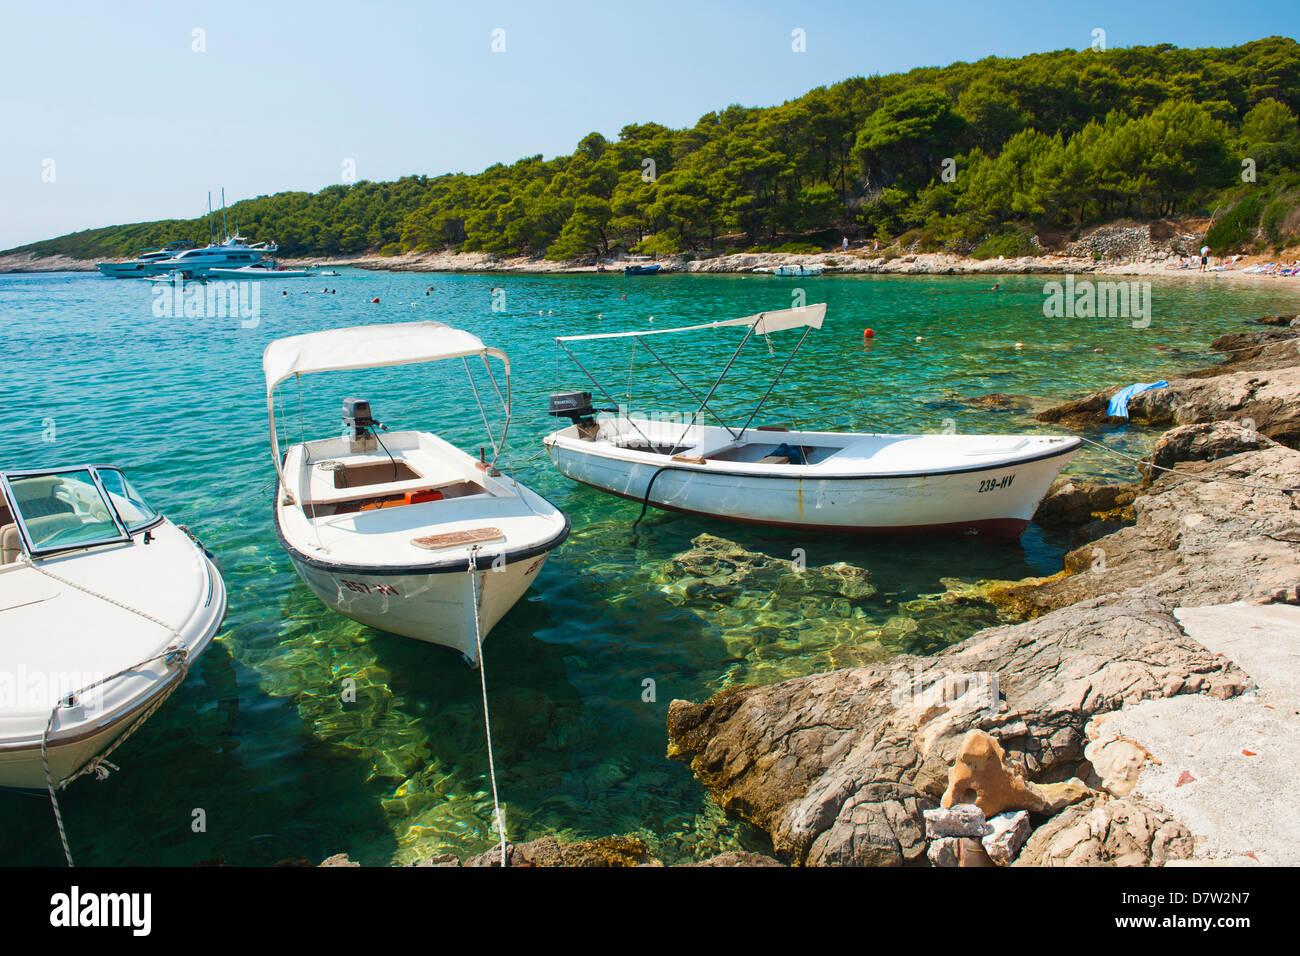 Boats in the Pakleni Islands (Paklinski Islands), Dalmatian Coast, Adriatic Sea, Croatia - Stock Image